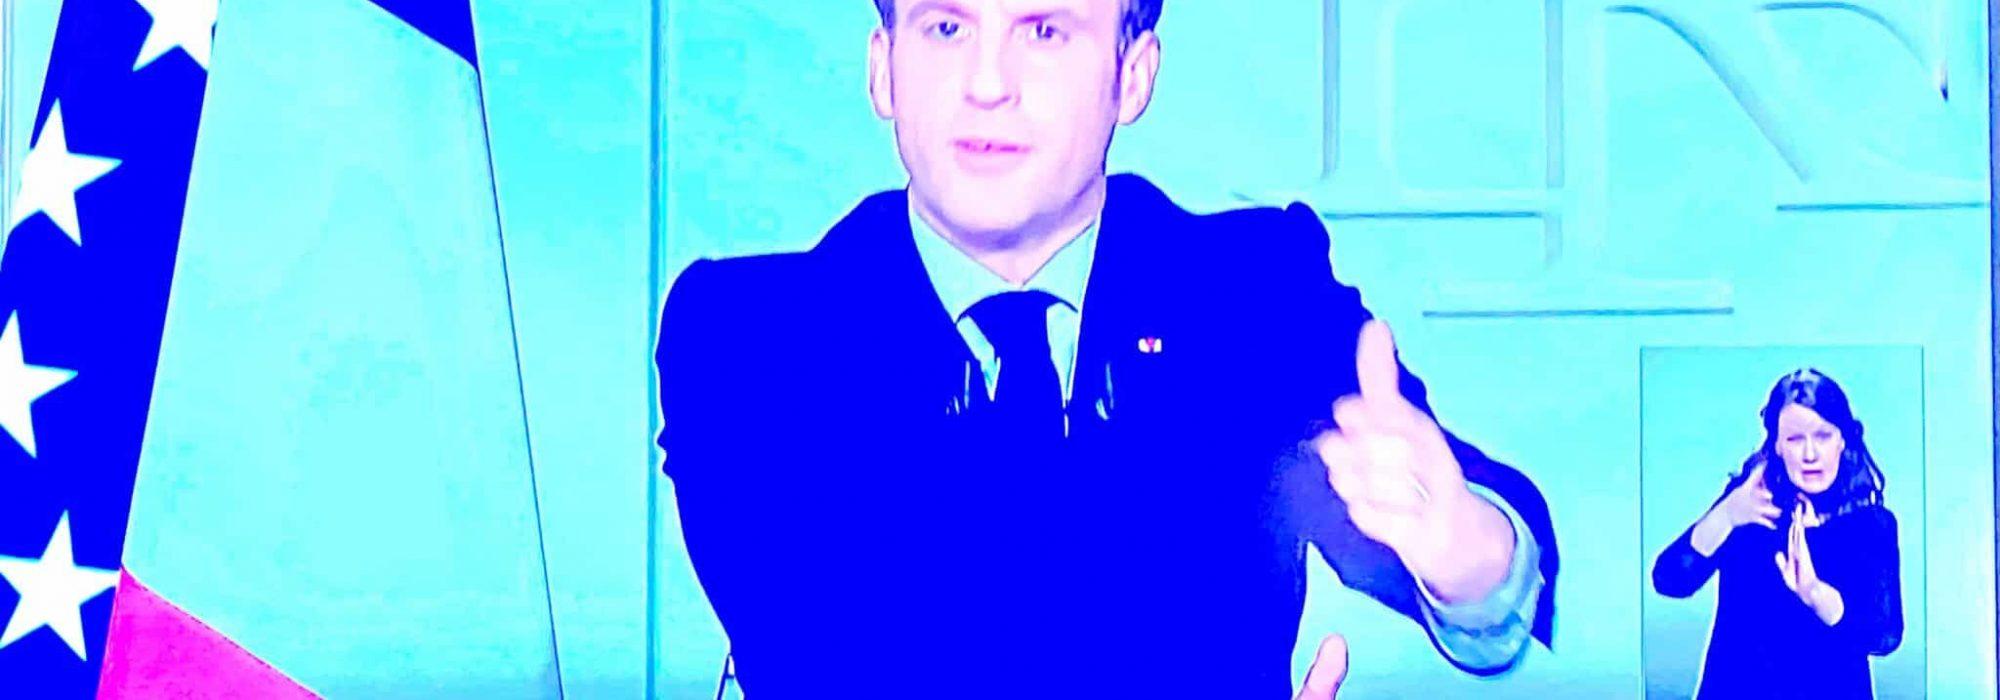 Macron 31 marca